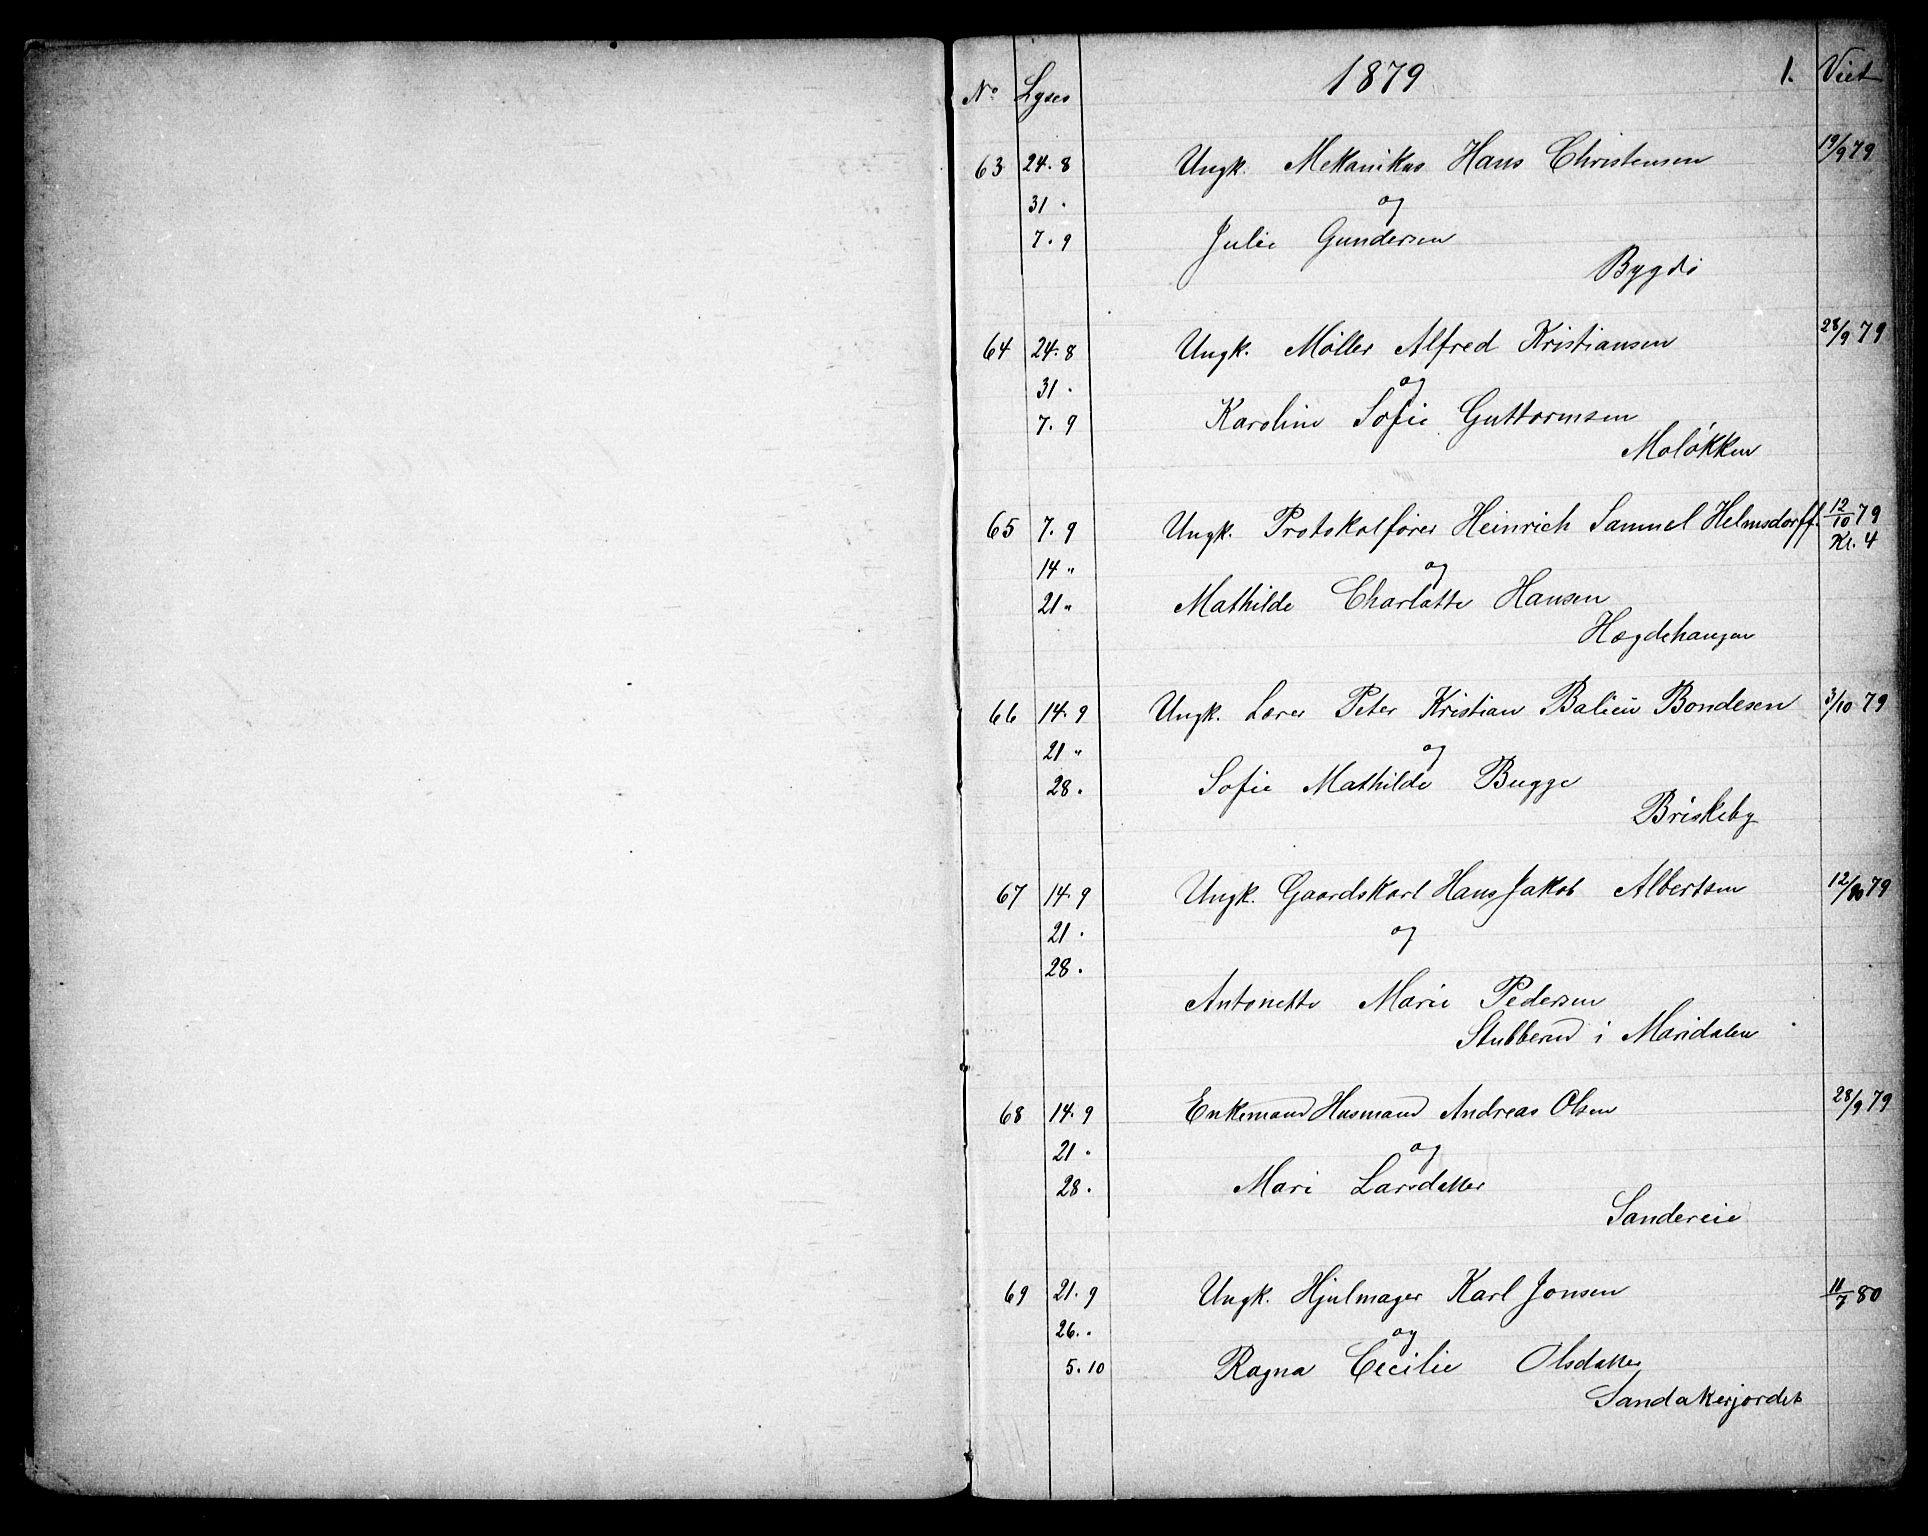 SAO, Vestre Aker prestekontor Kirkebøker, G/Ga/L0005: Klokkerbok nr. I 5, 1879-1901, s. 0-1